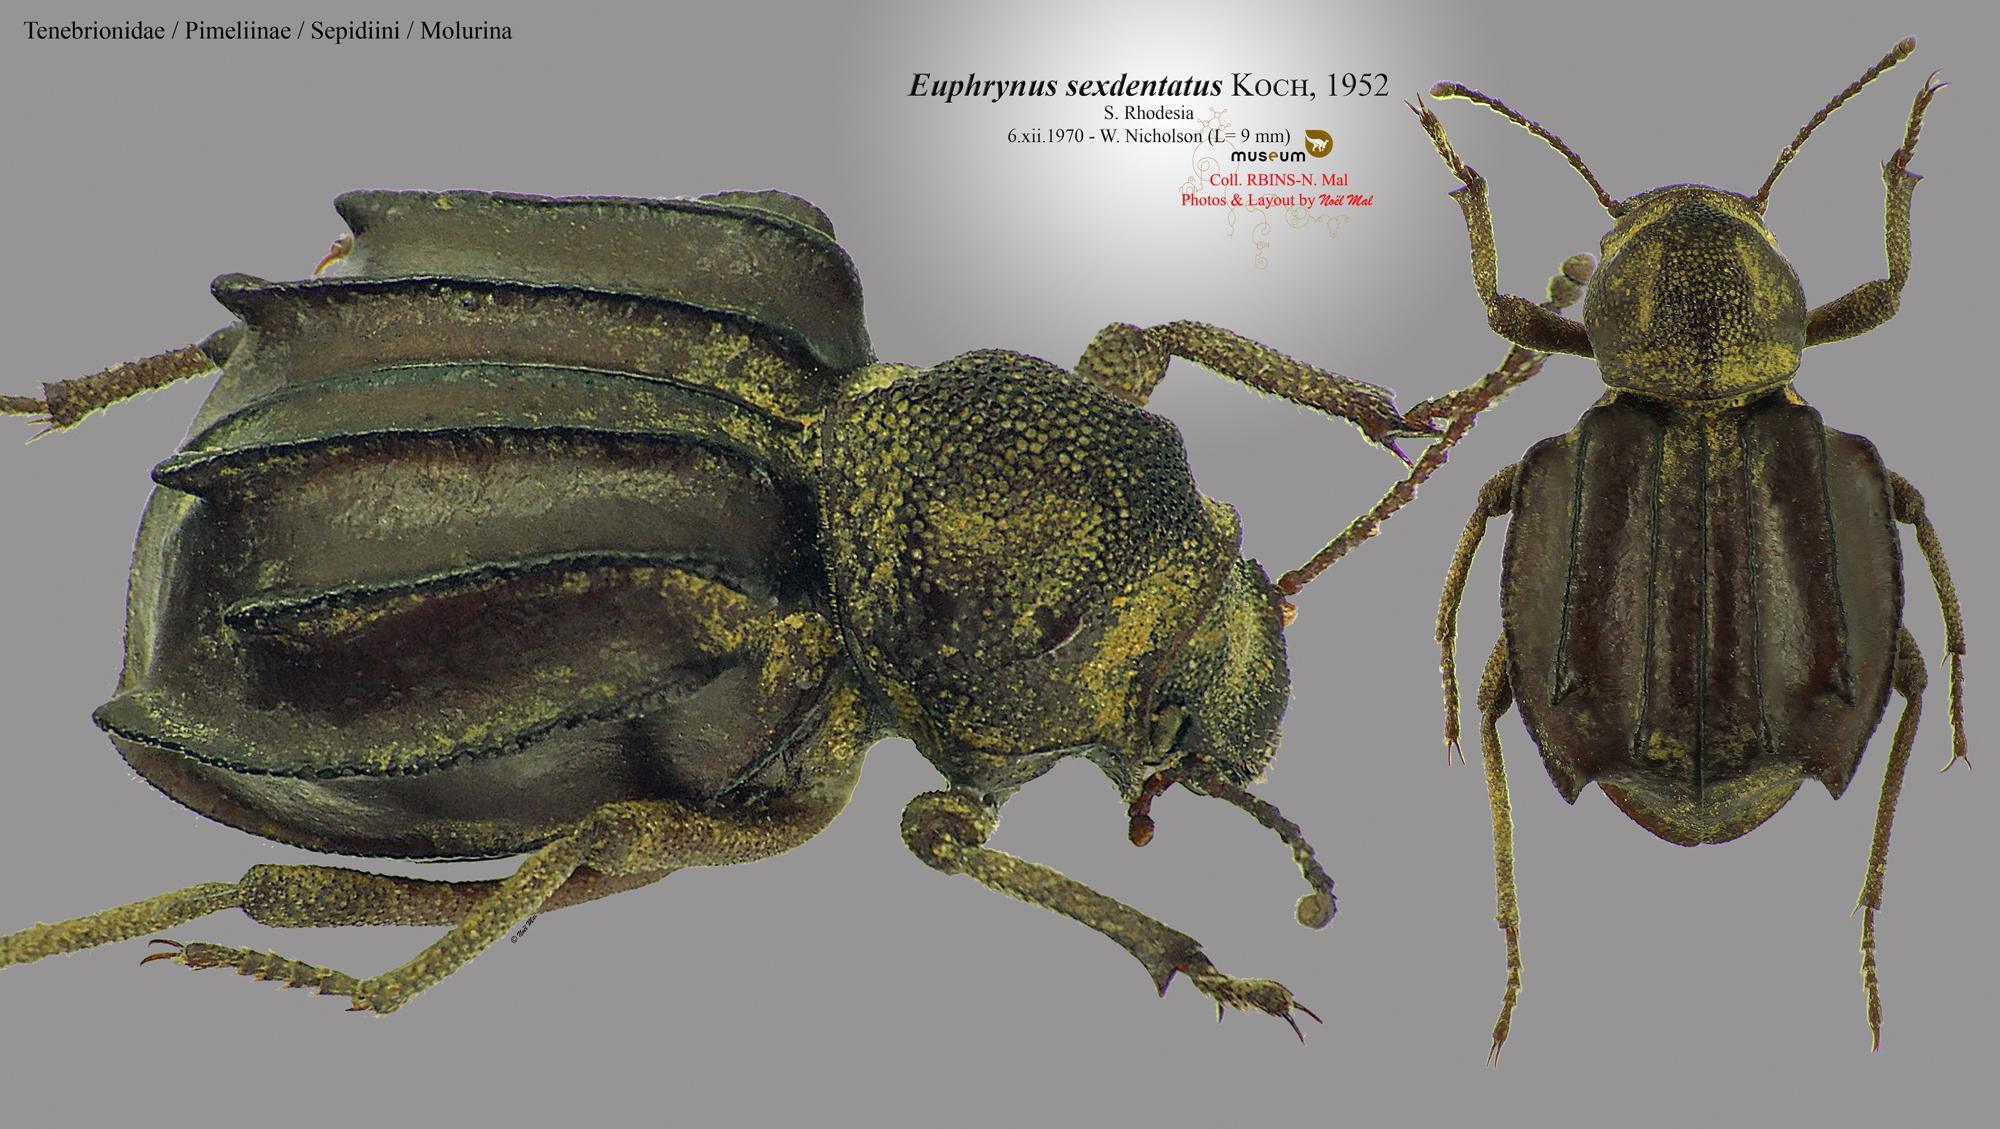 Euphrynus sexdentatus.jpg